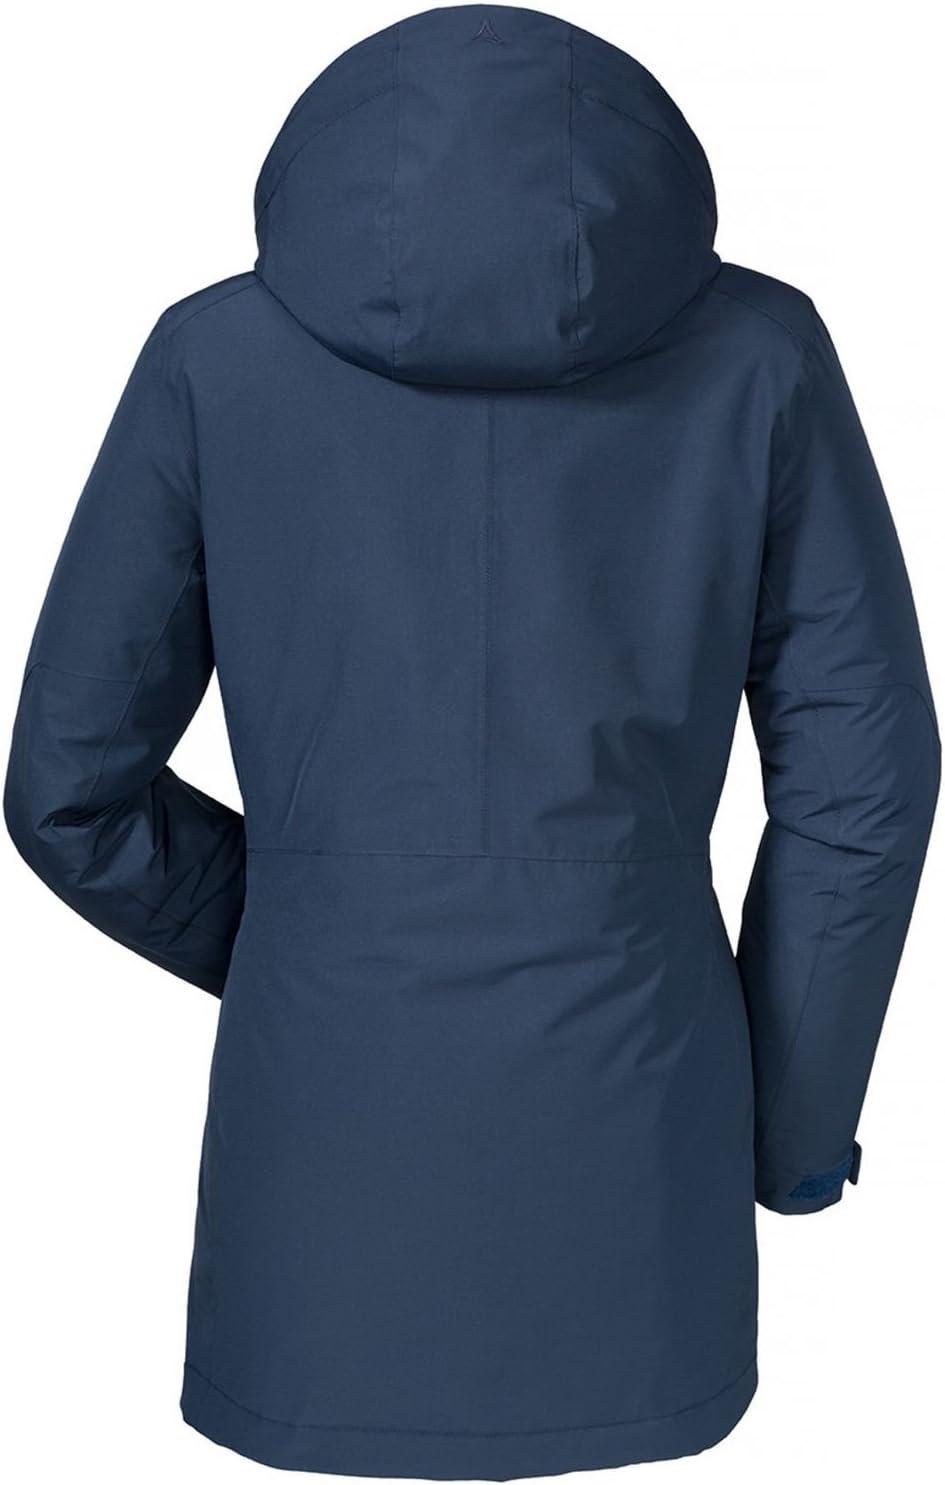 Sch/öffel Damen Insulated Jacket Portillo Jacken